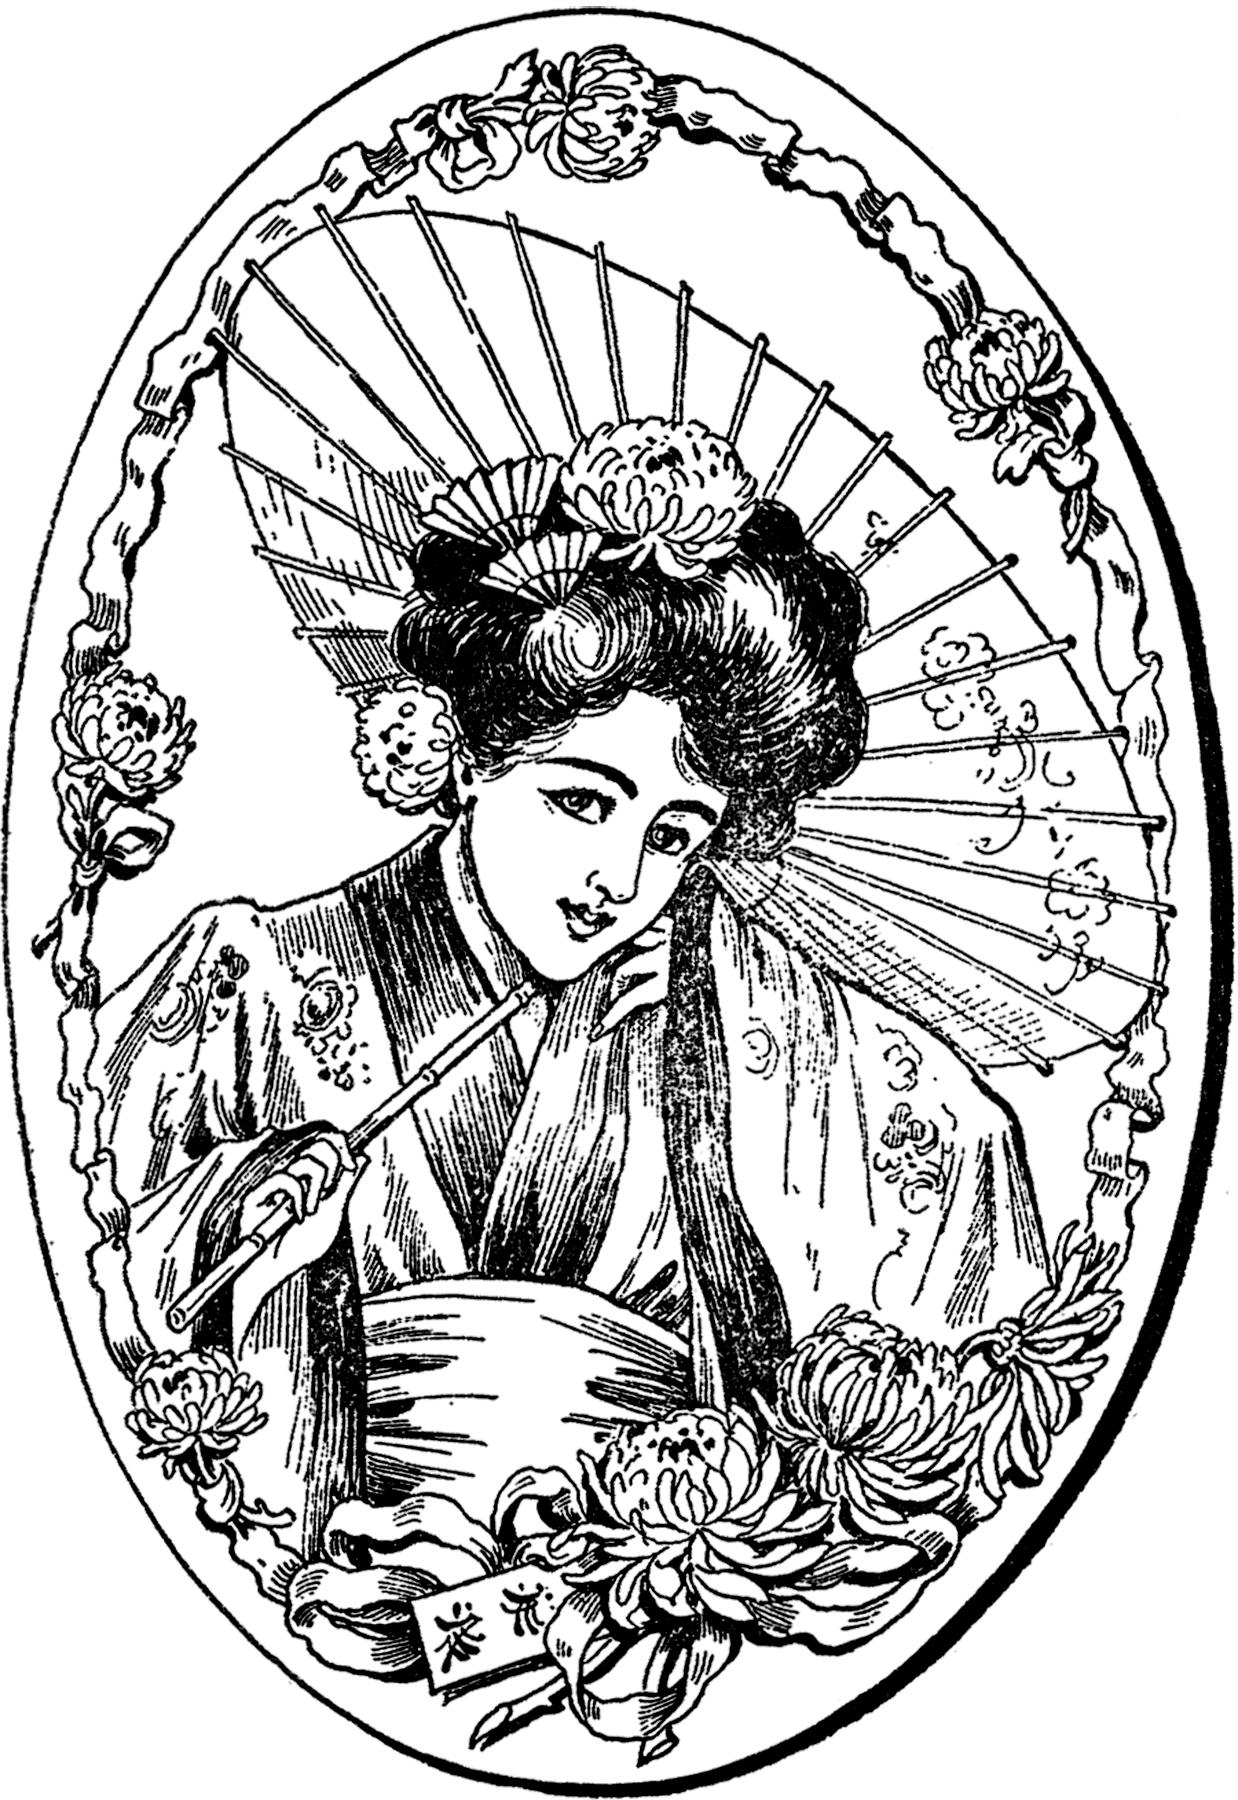 Beautiful Vintage Geisha Lady Image! - The Graphics Fairy